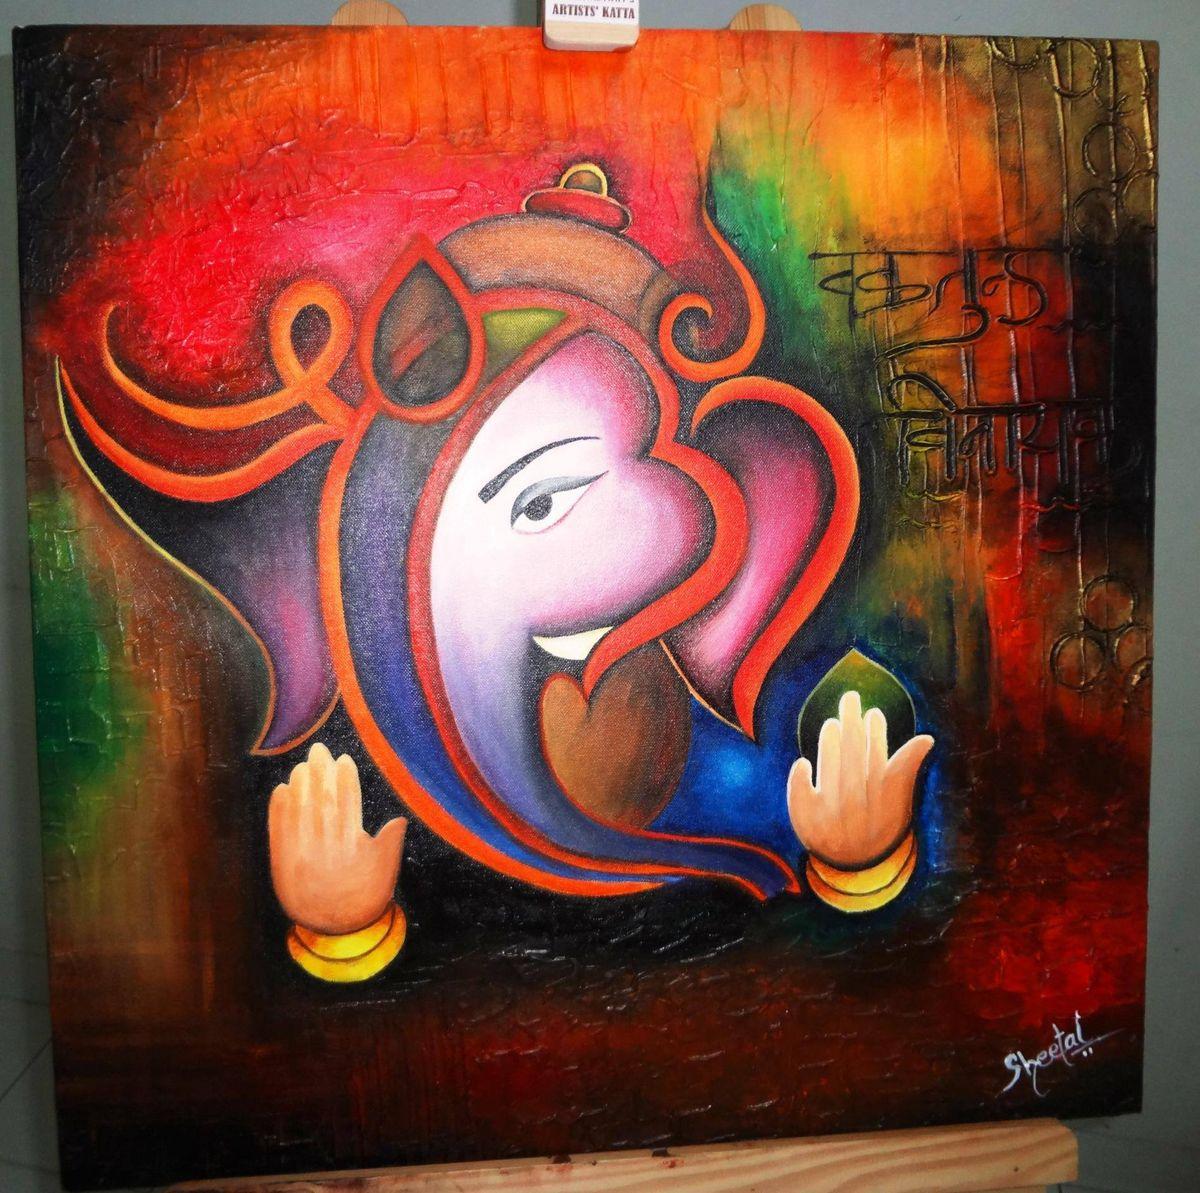 1000+ images about Ganpati : My Stylish Lord on Pinterest ...